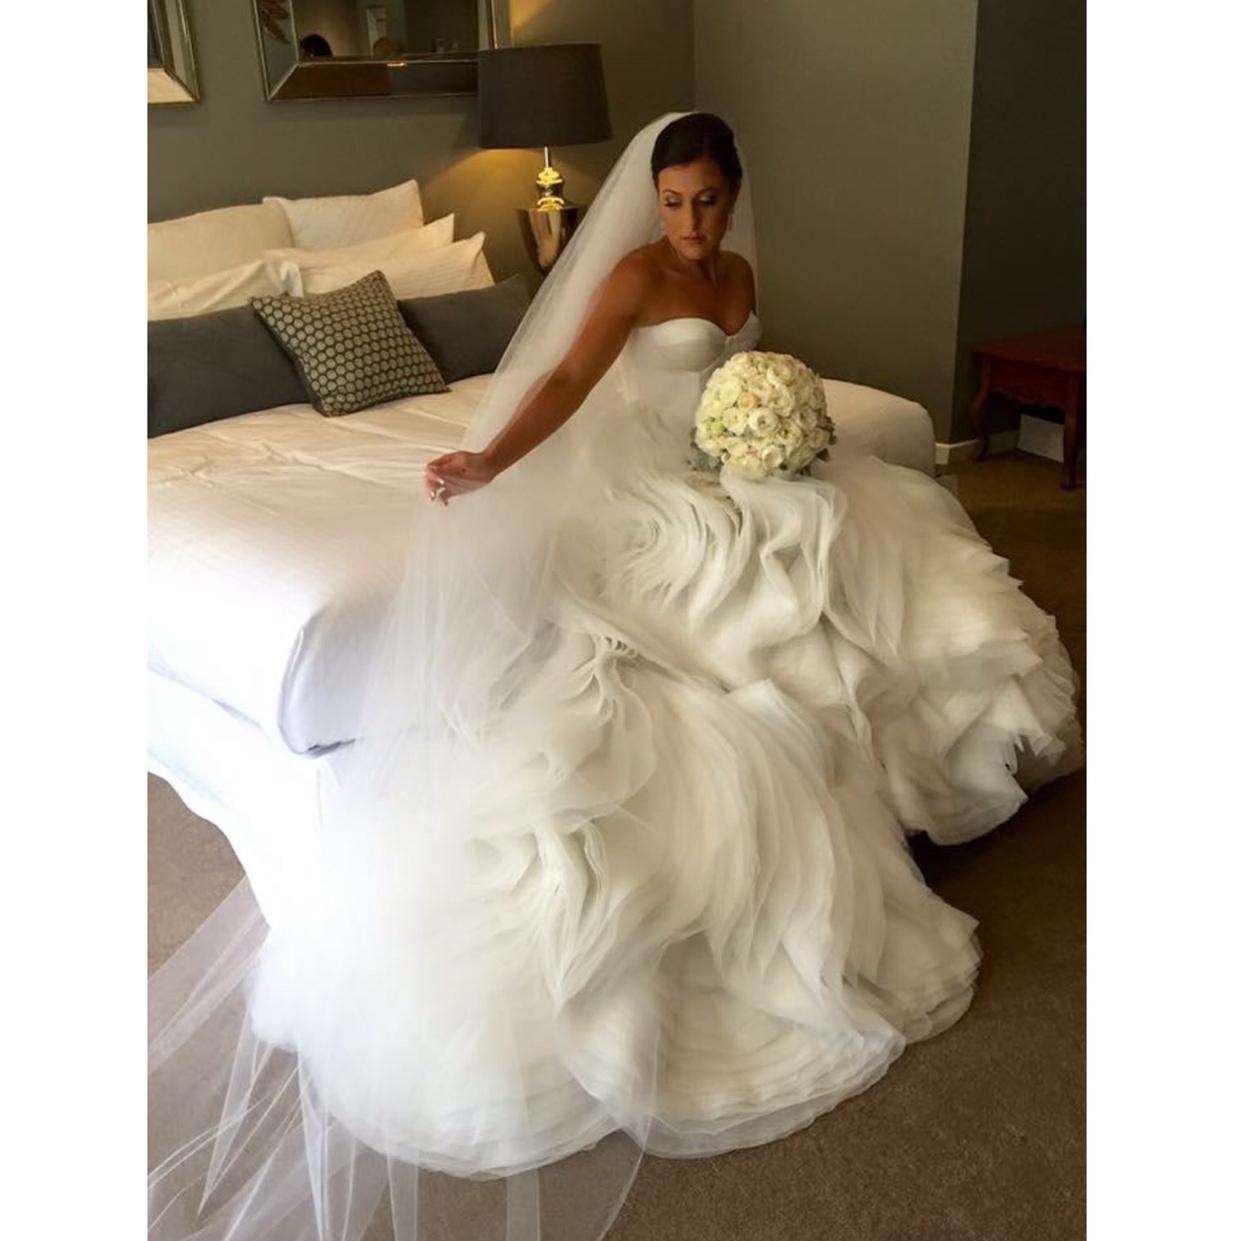 Henry Roth Second Hand Wedding Dress On Sale 82 Off: Violetta Bridal Custom Made Second Hand Wedding Dress On